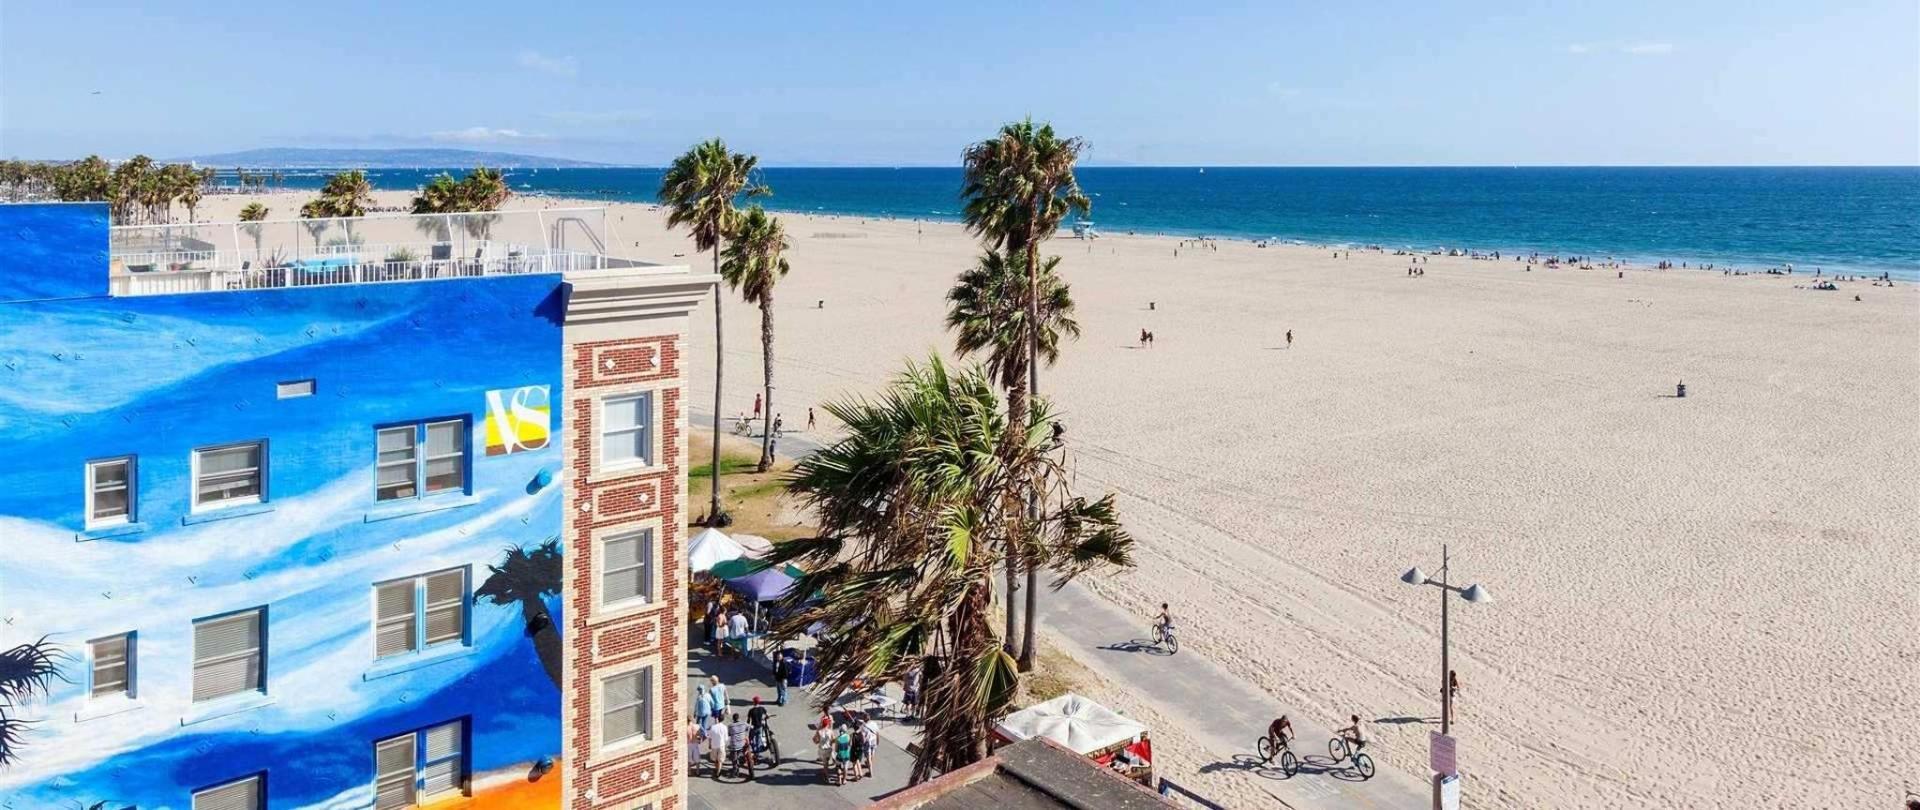 buuteeq-vs-exterior-beach.jpg.1920x810_default.jpeg.1920x810.jpeg